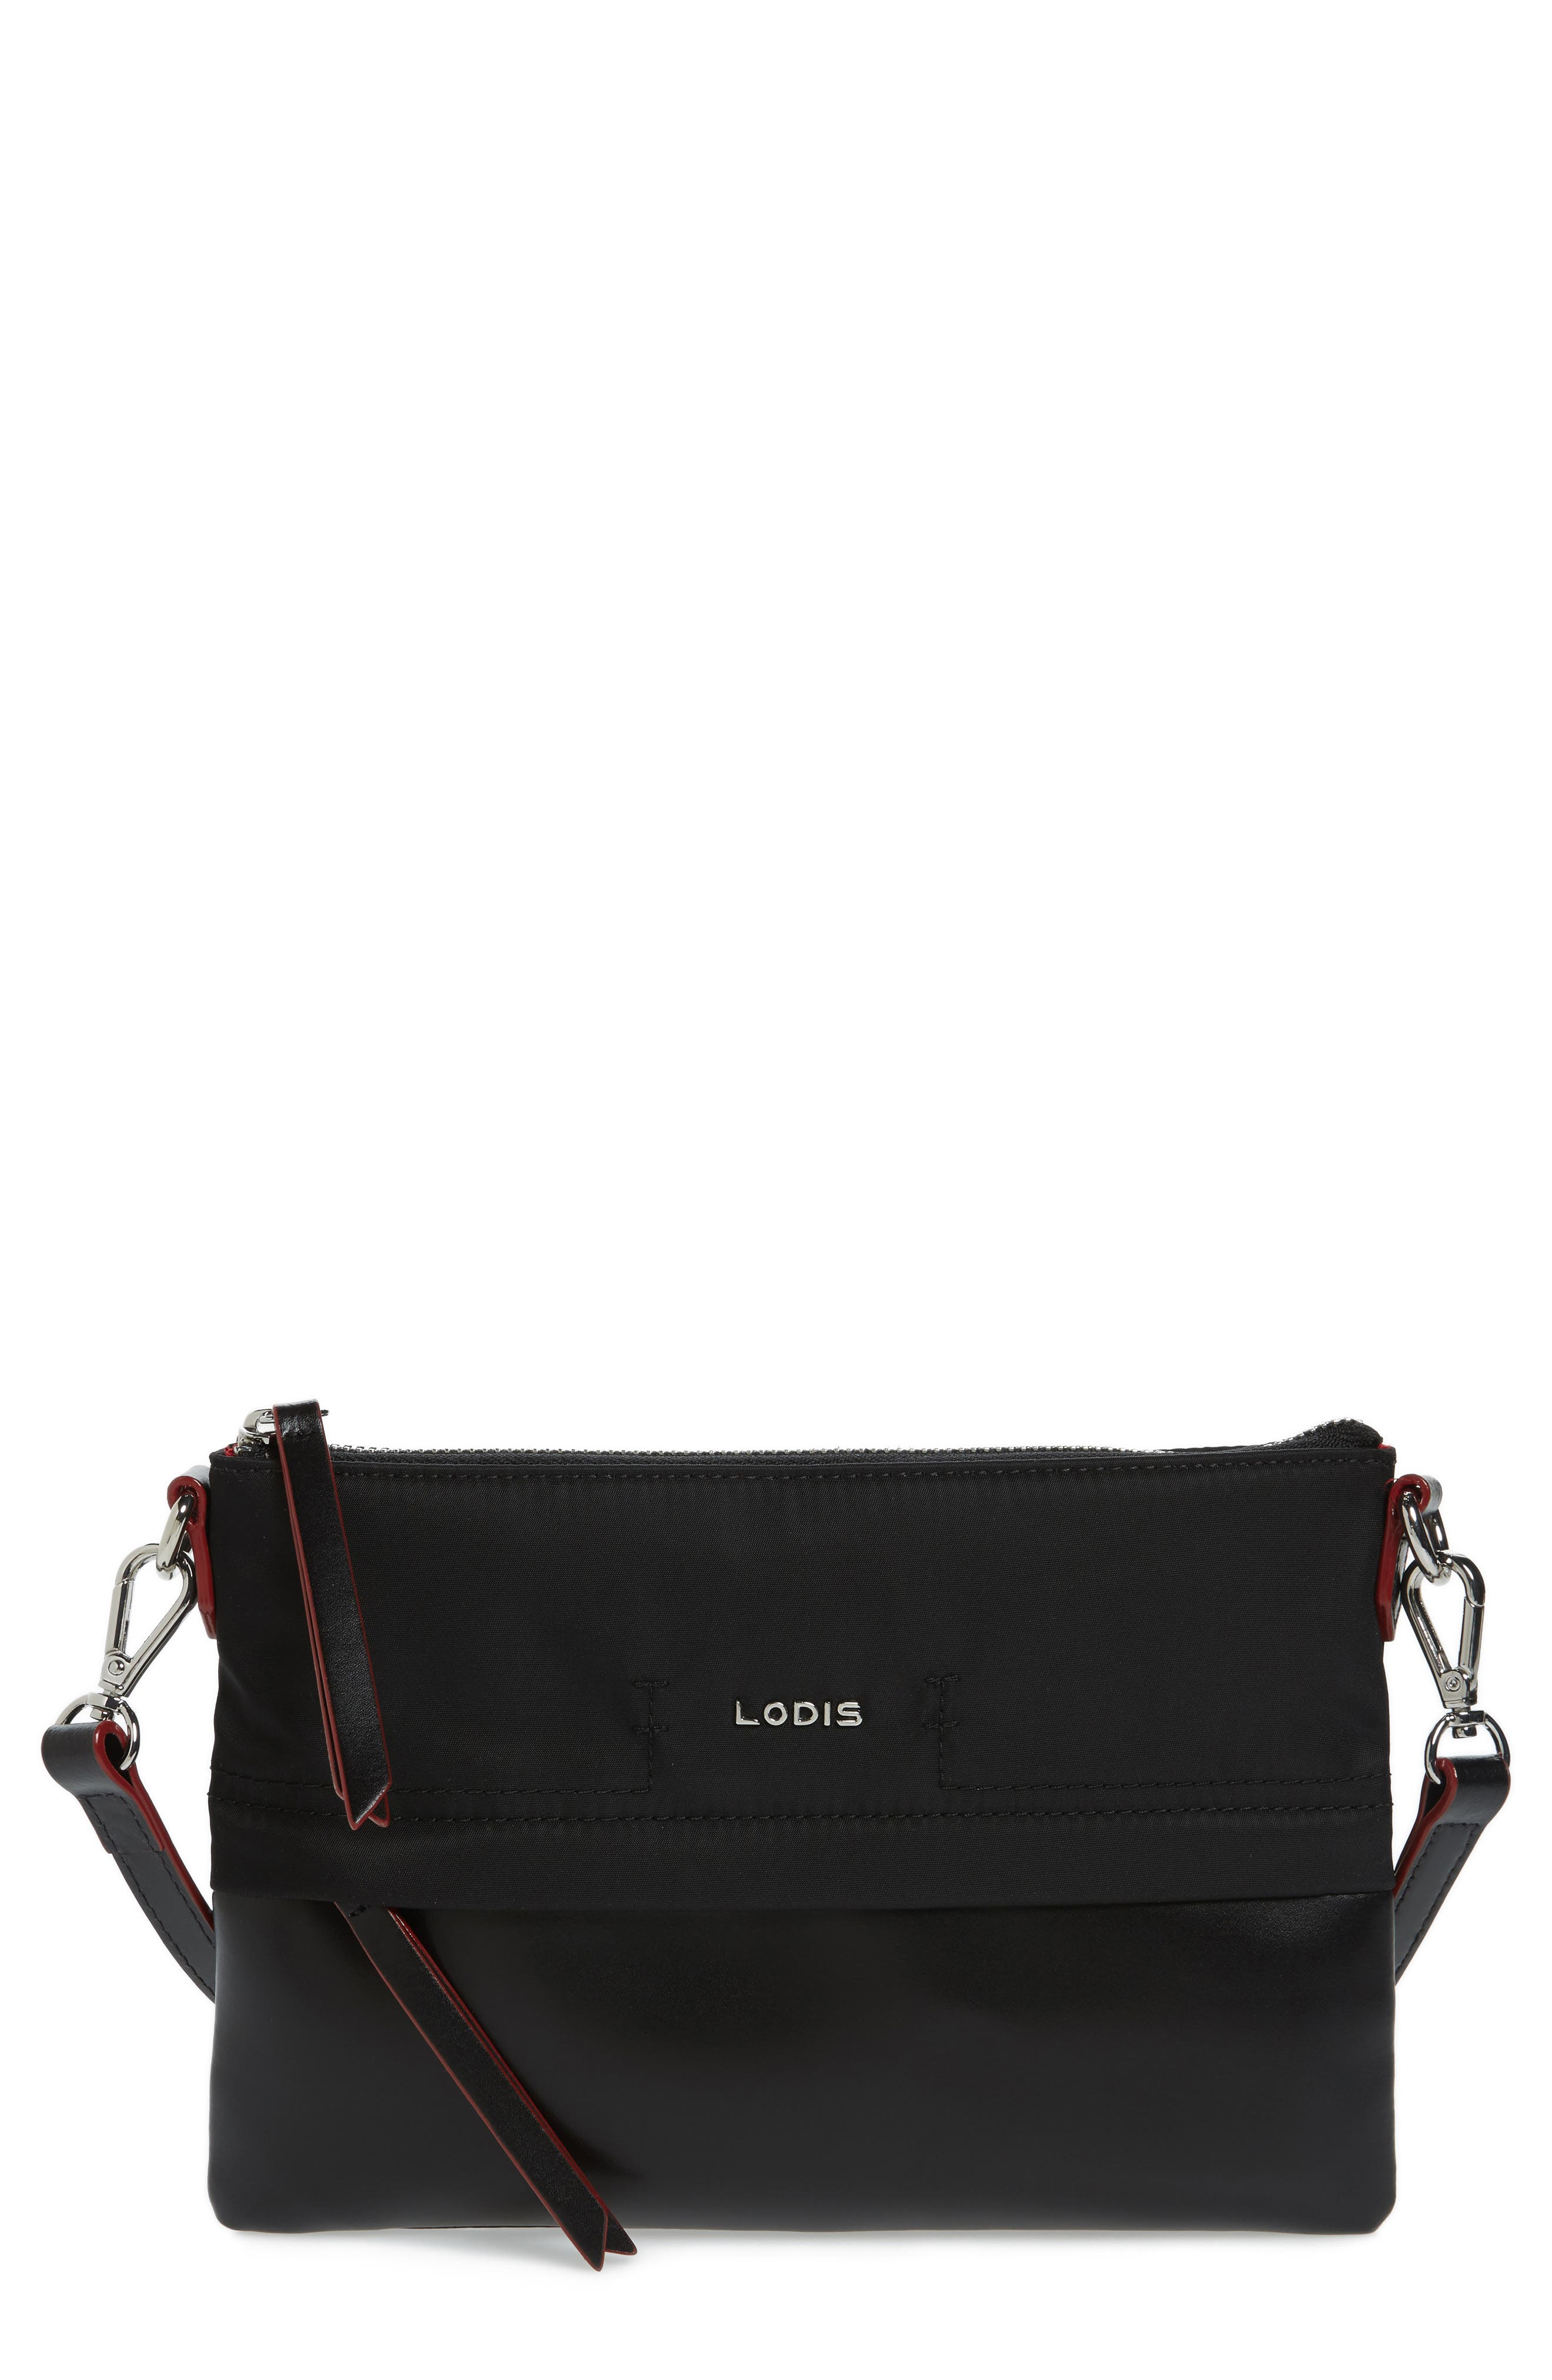 Lodis Kala Leather Convertible Crossbody Bag